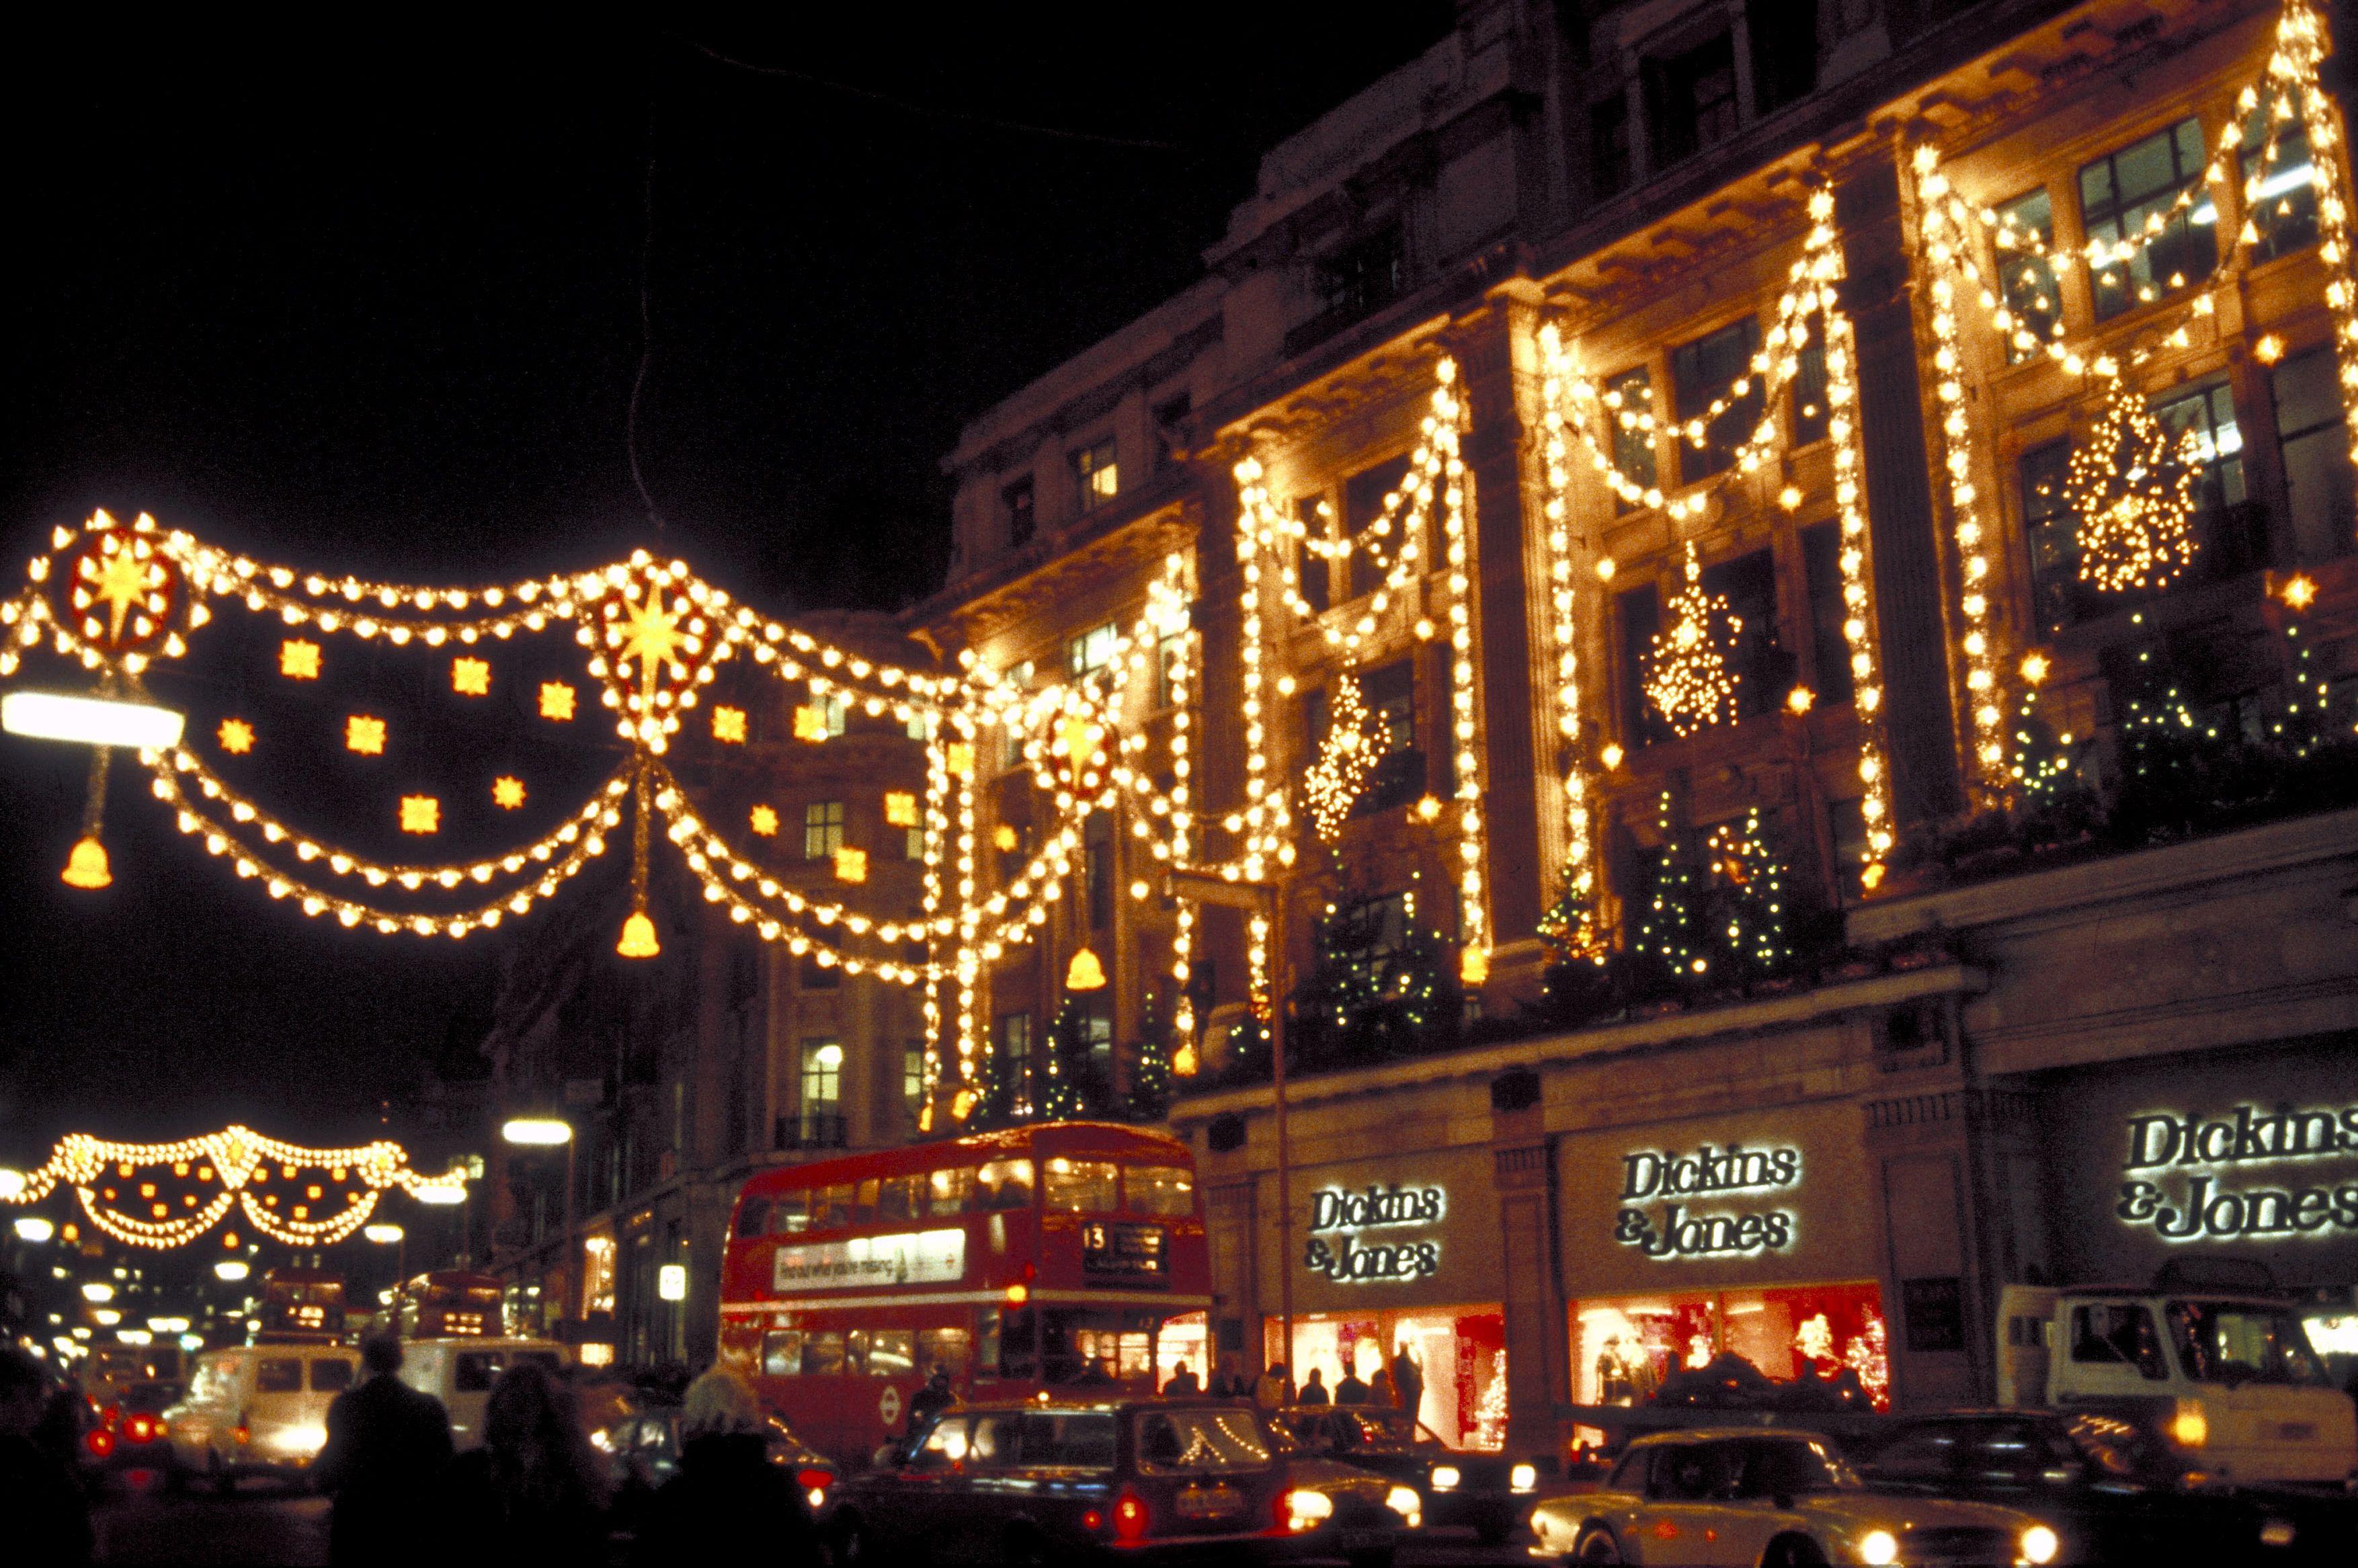 London Christmas Shopping Guide In 2020 London Christmas Christmas Shopping Guide Christmas Travel